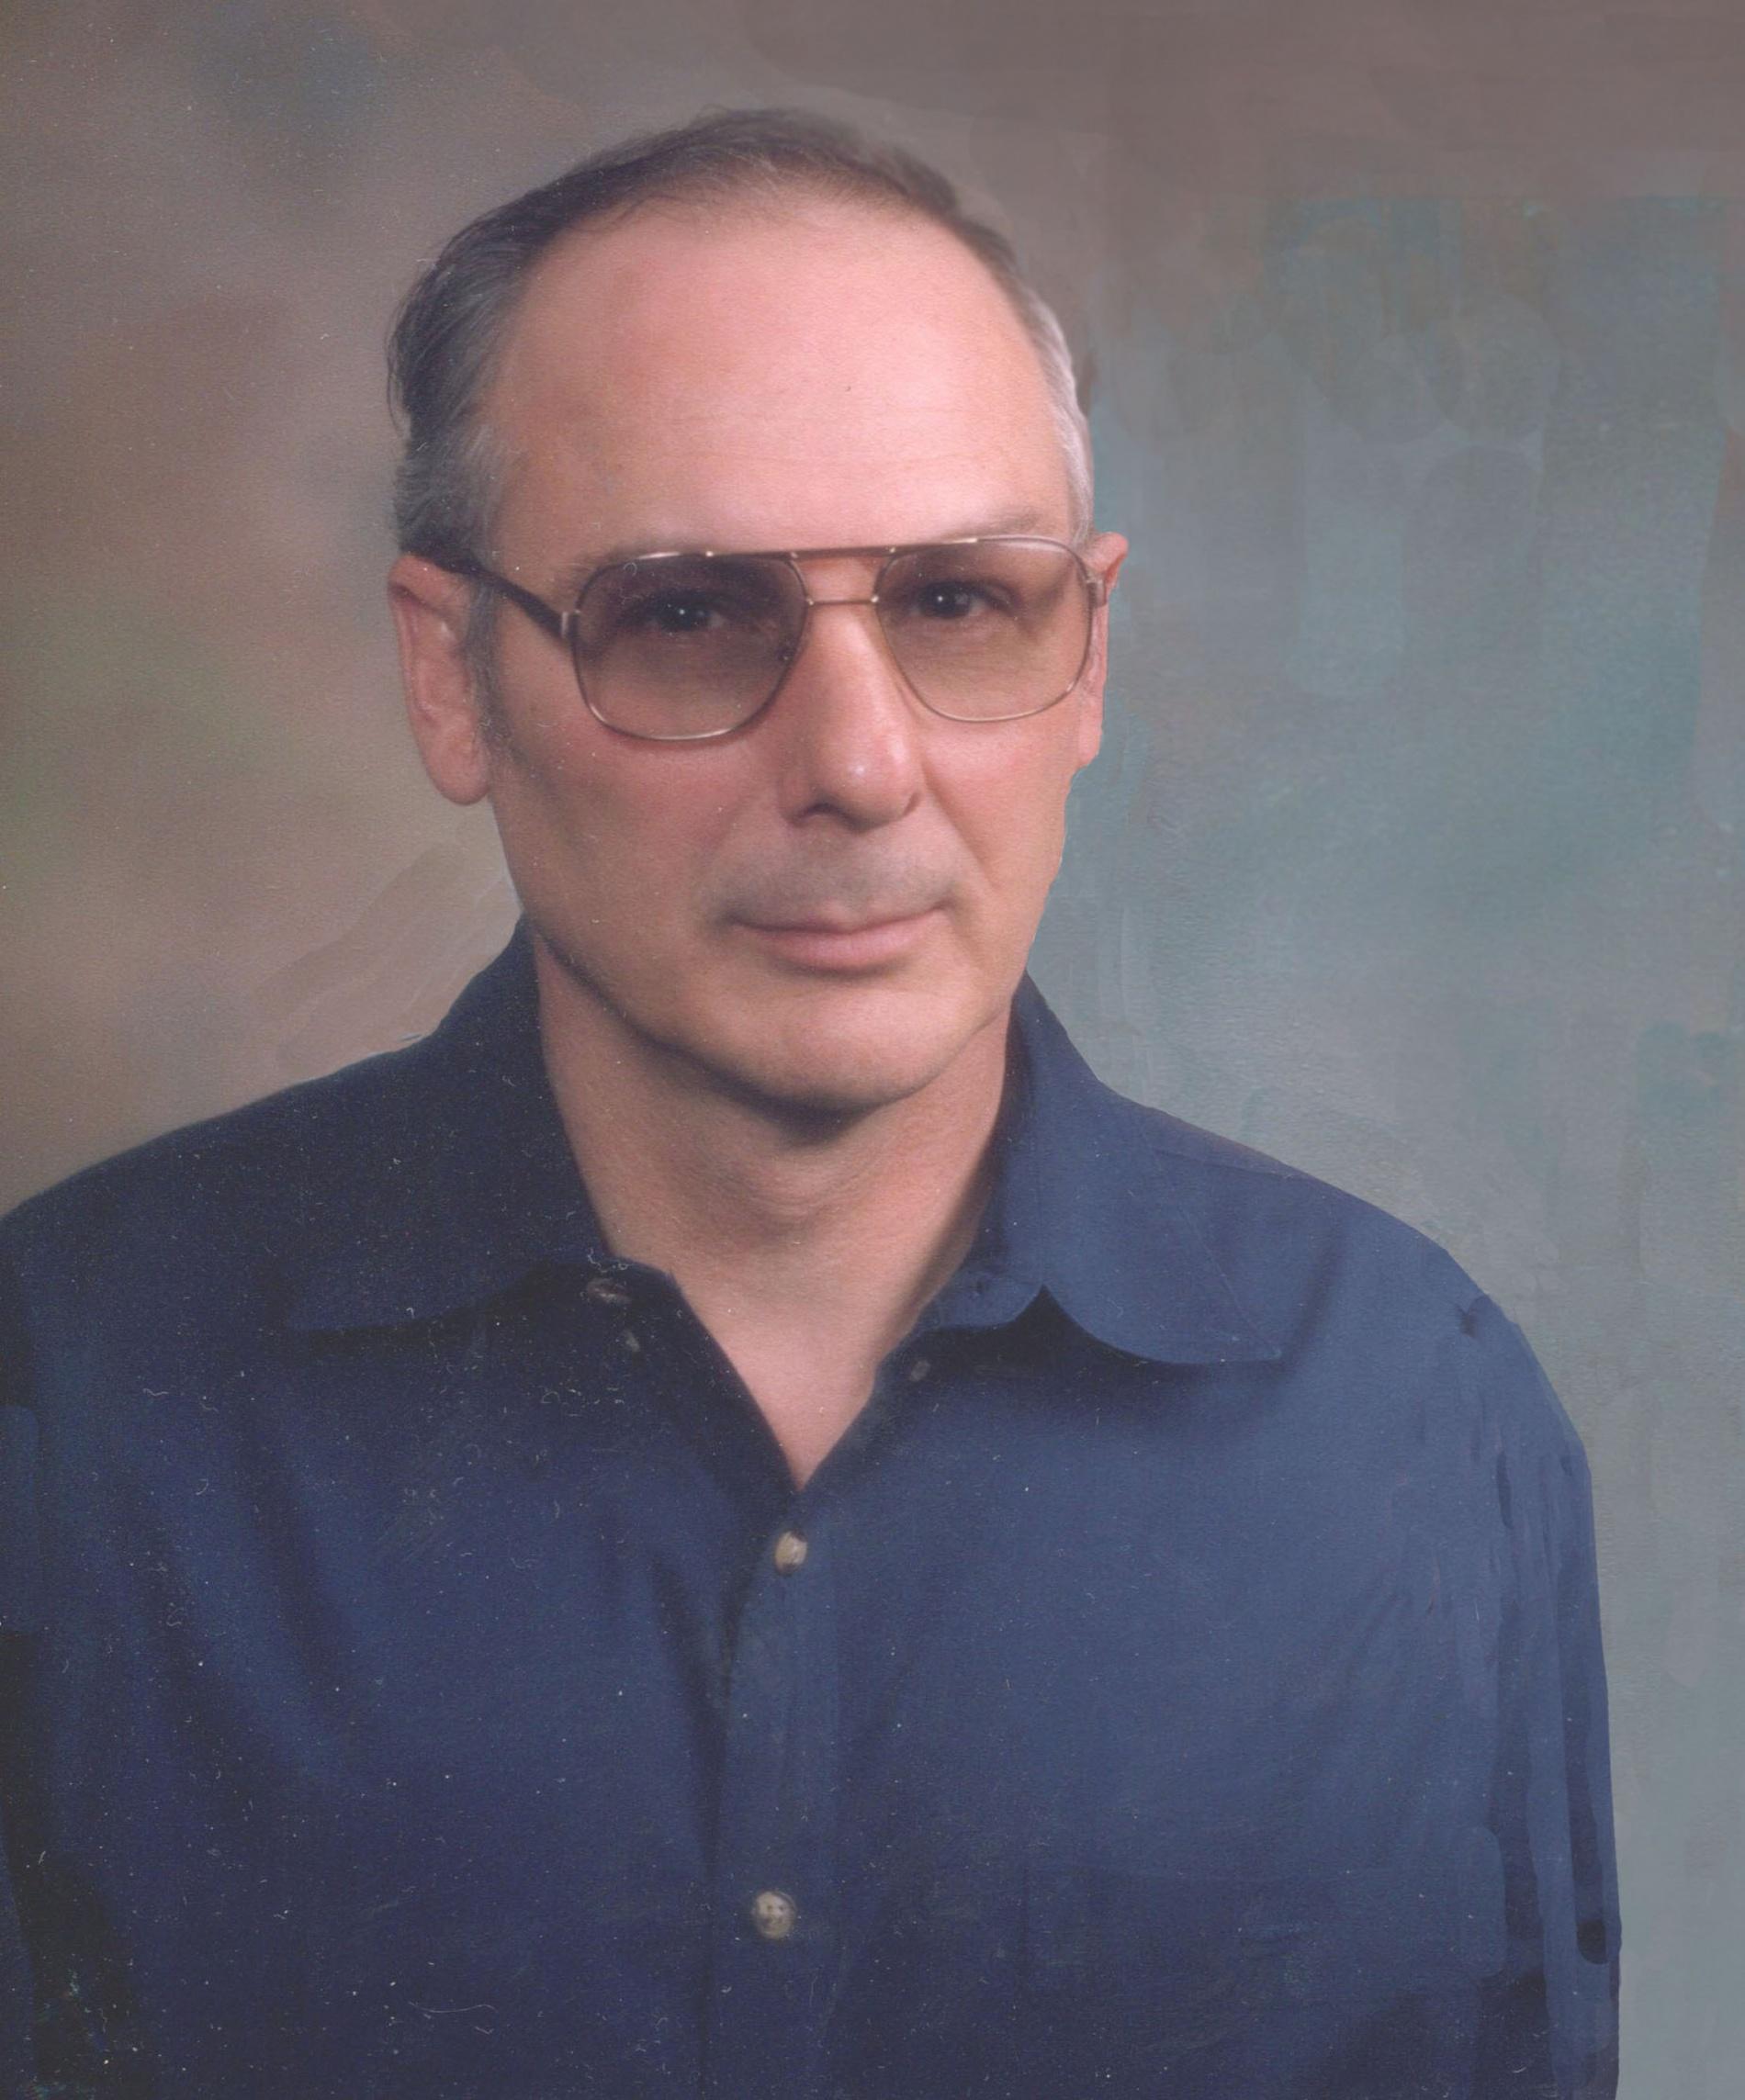 Jerry Steven Koros, 68, Scottsbluff